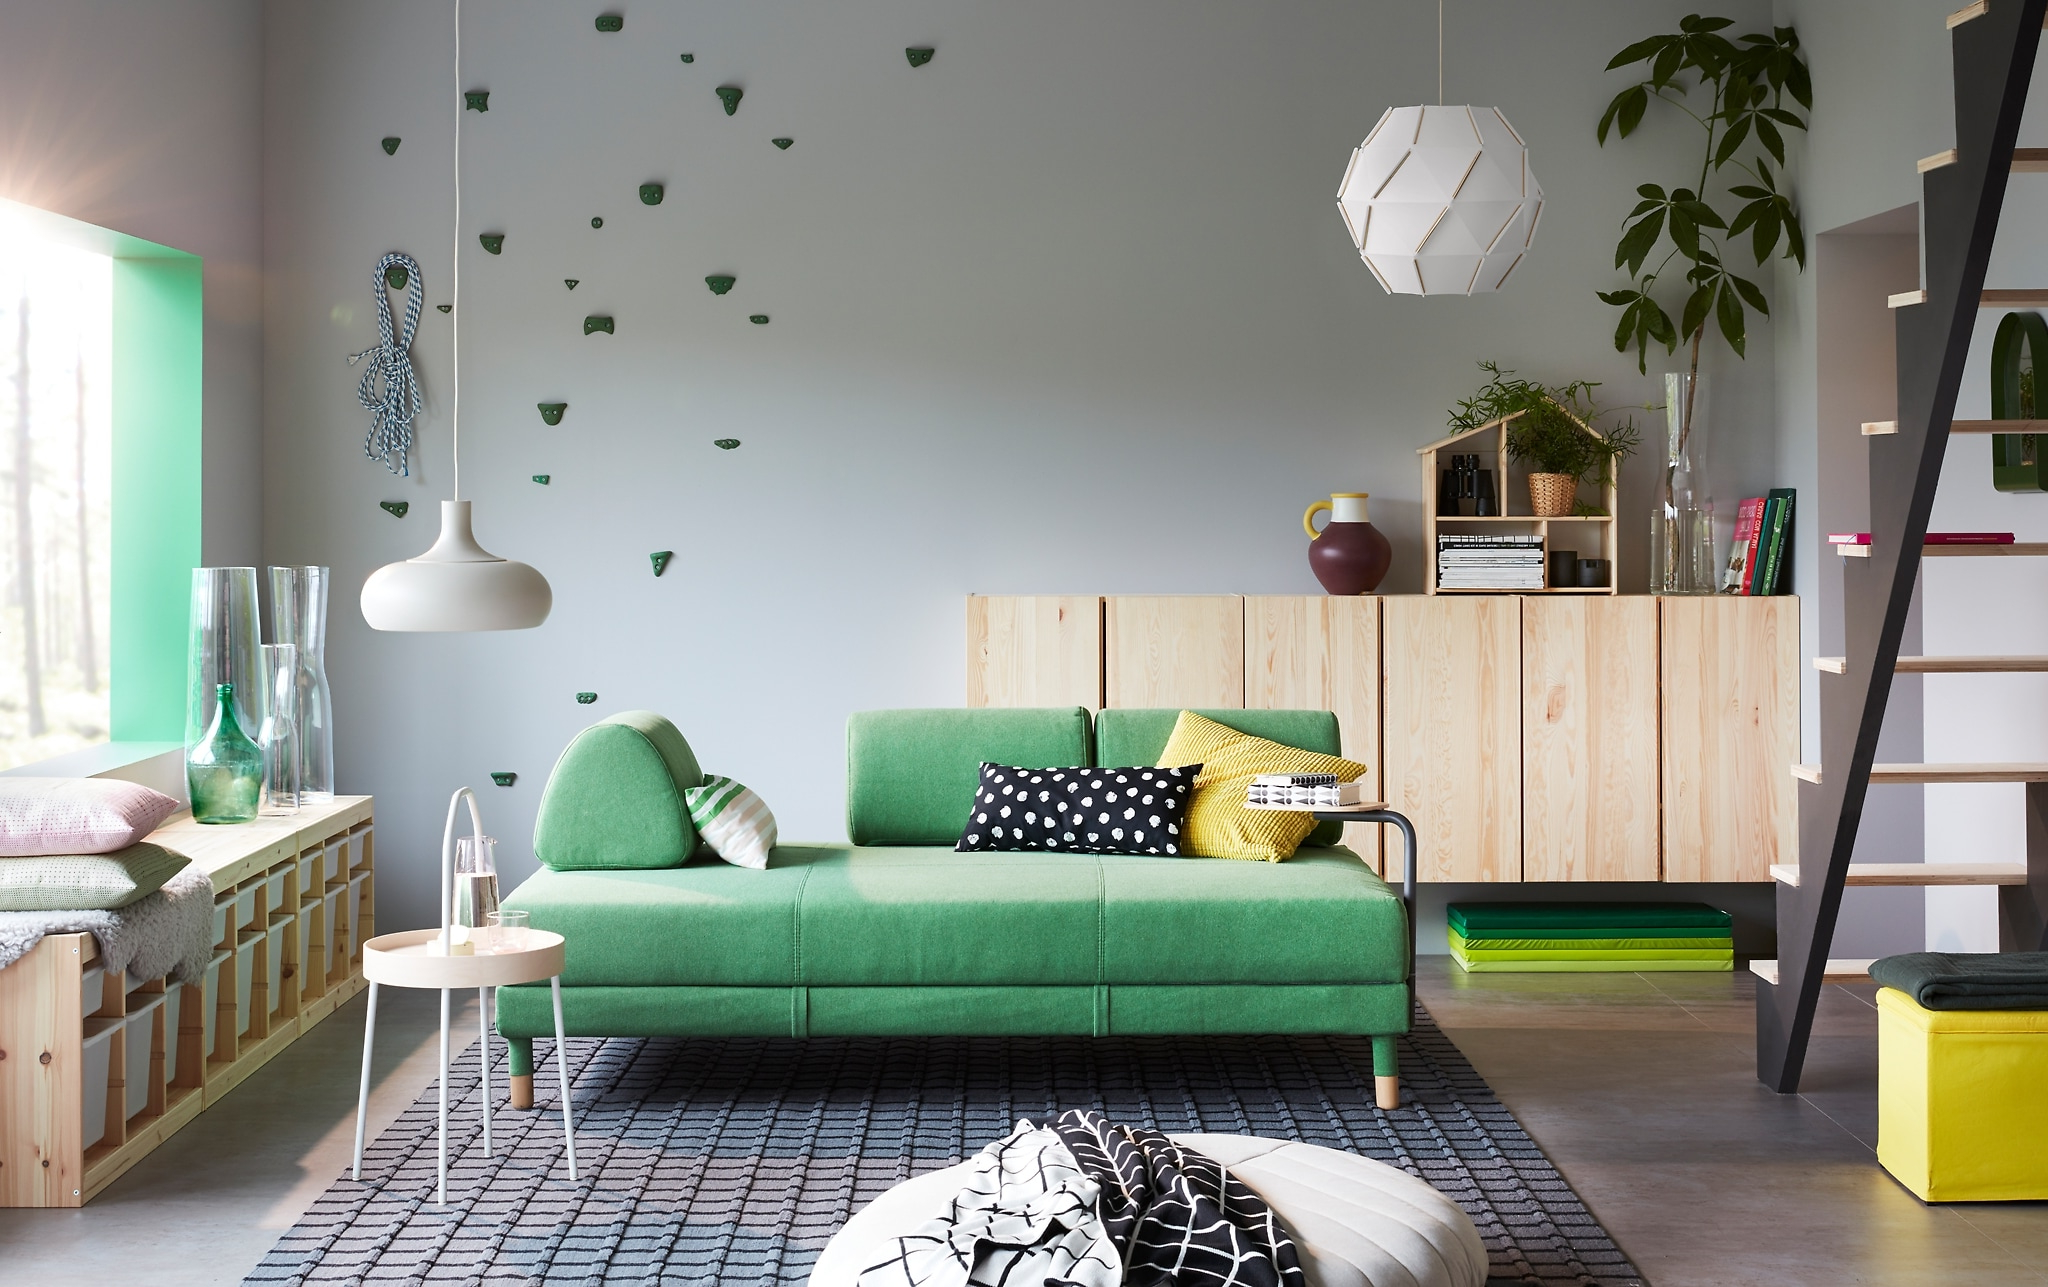 Muebles De Salon Ikea Ofertas T8dj Salà N Muebles Para El Salà N Pra Online Ikea